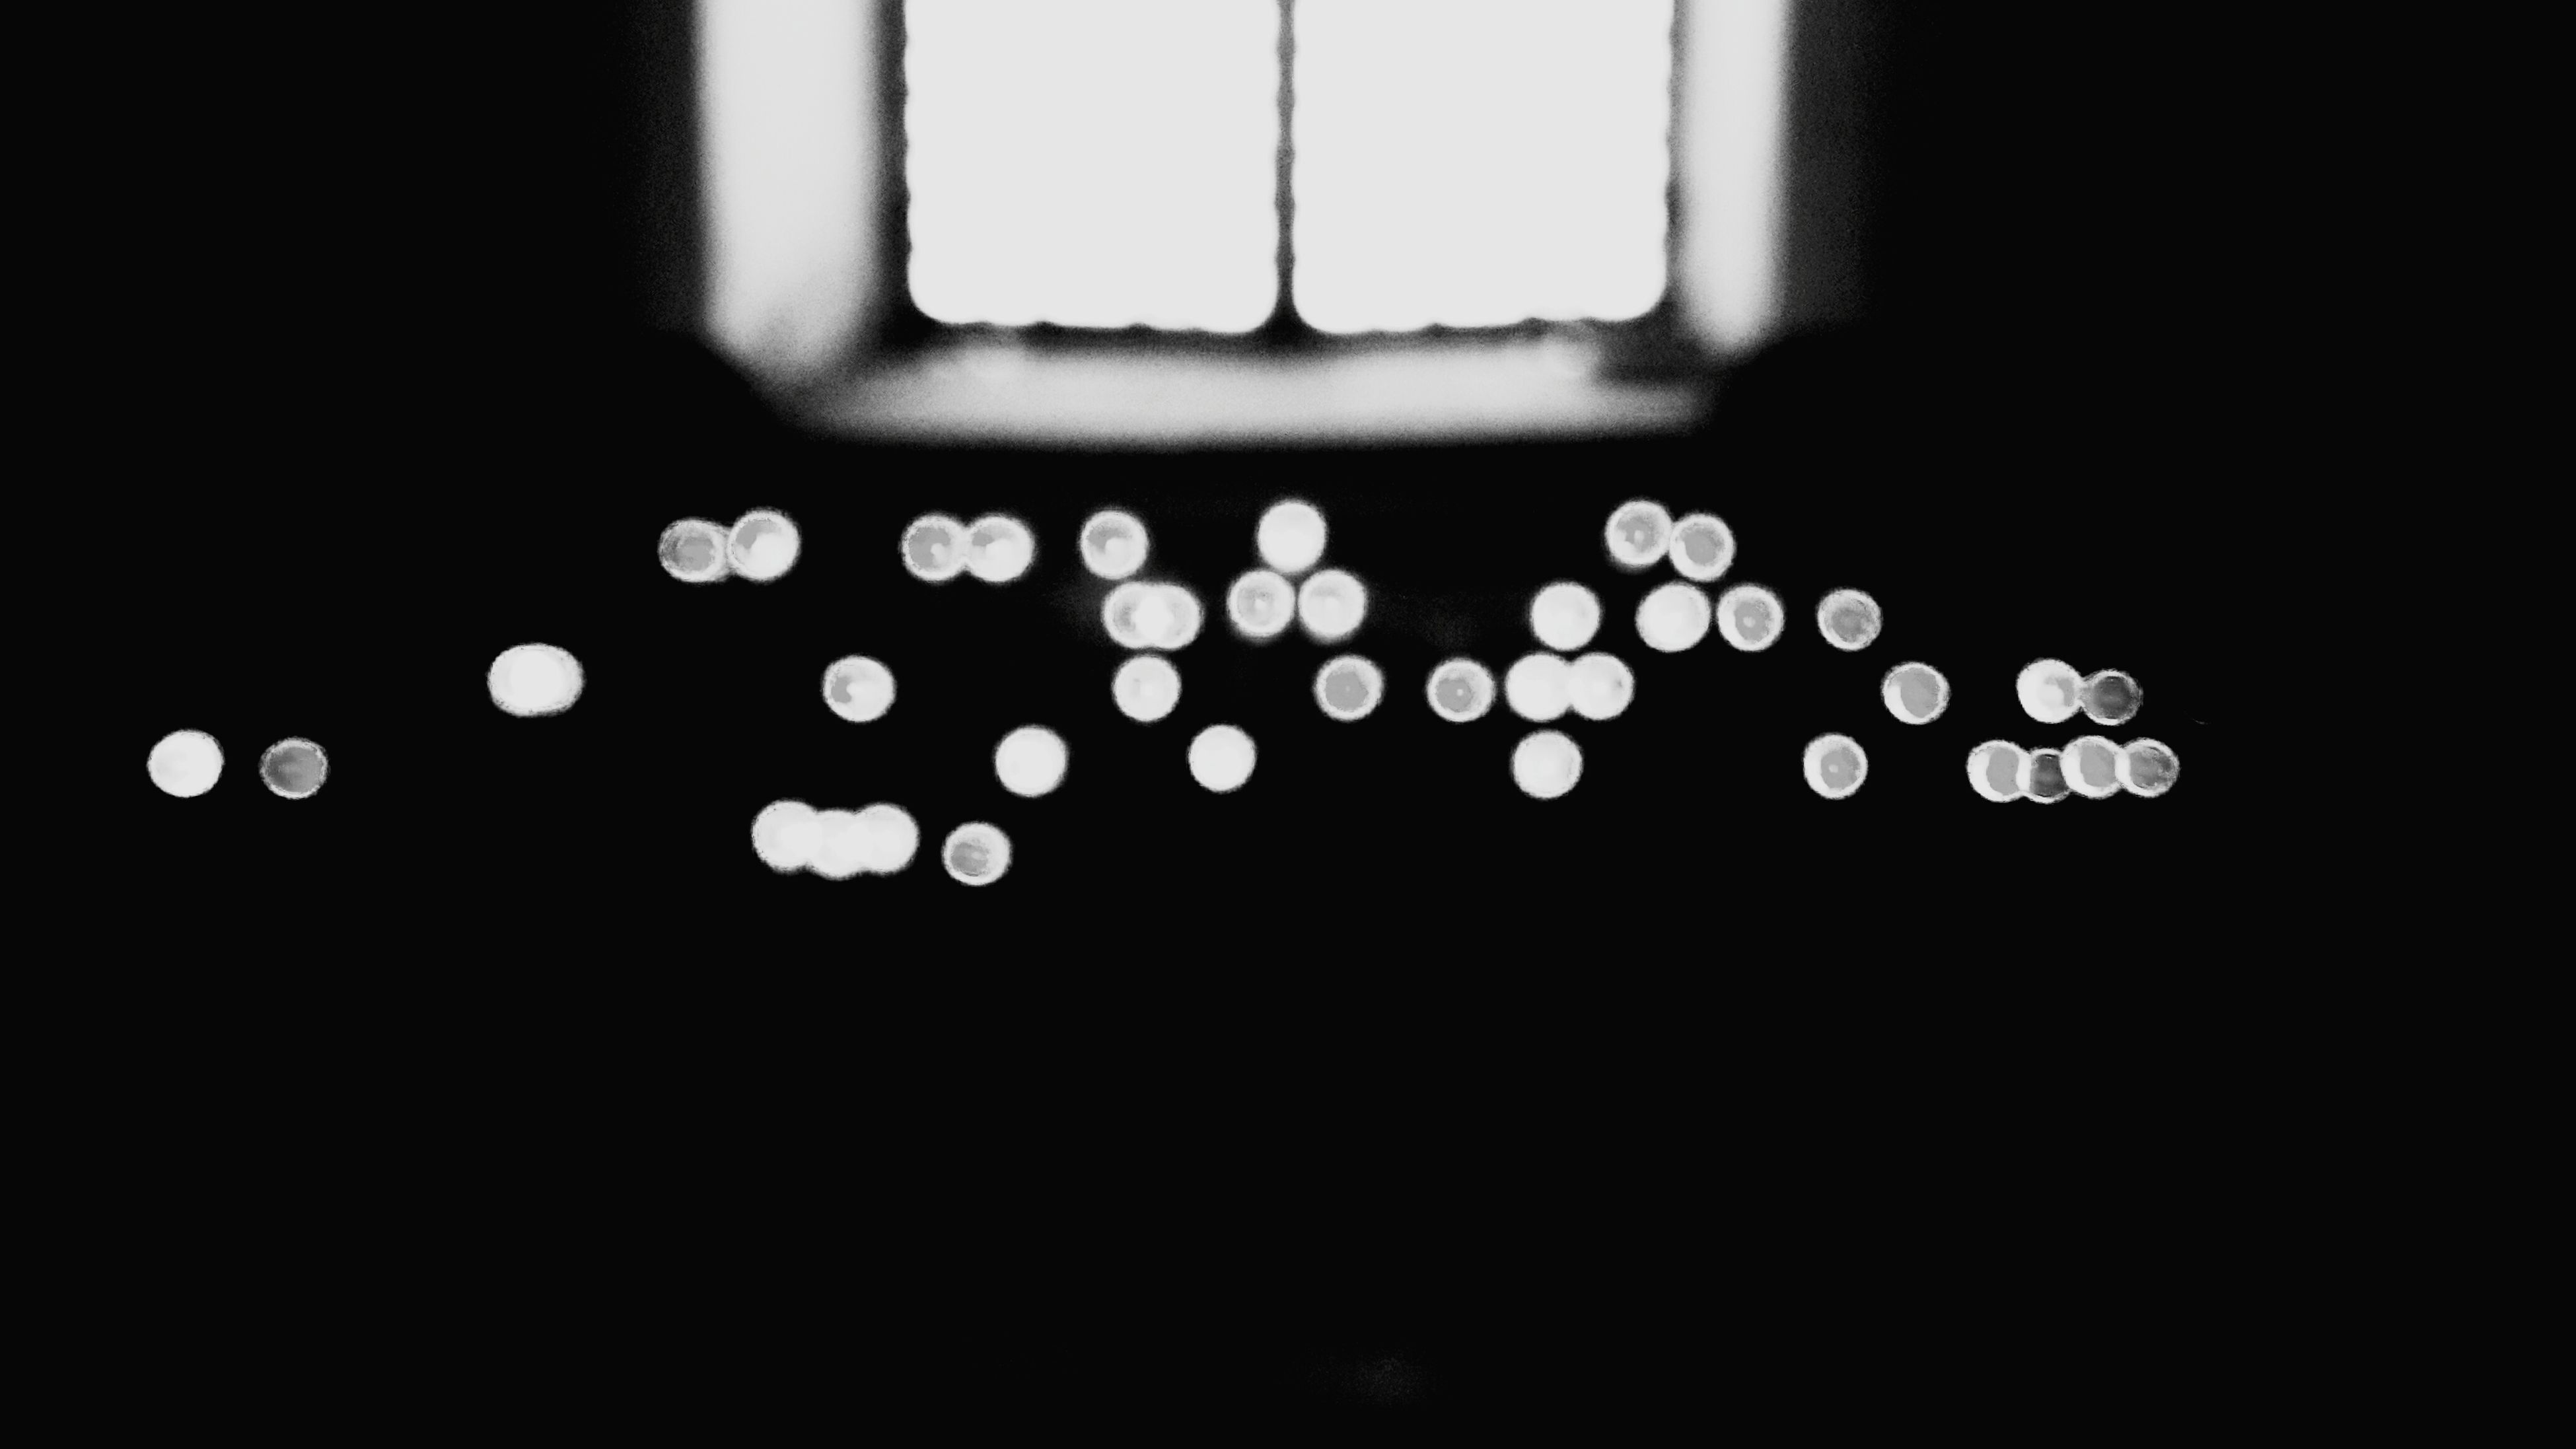 indoors, dark, defocused, close-up, illuminated, light, ideas, lit, blue, lens flare, electric light, surface level